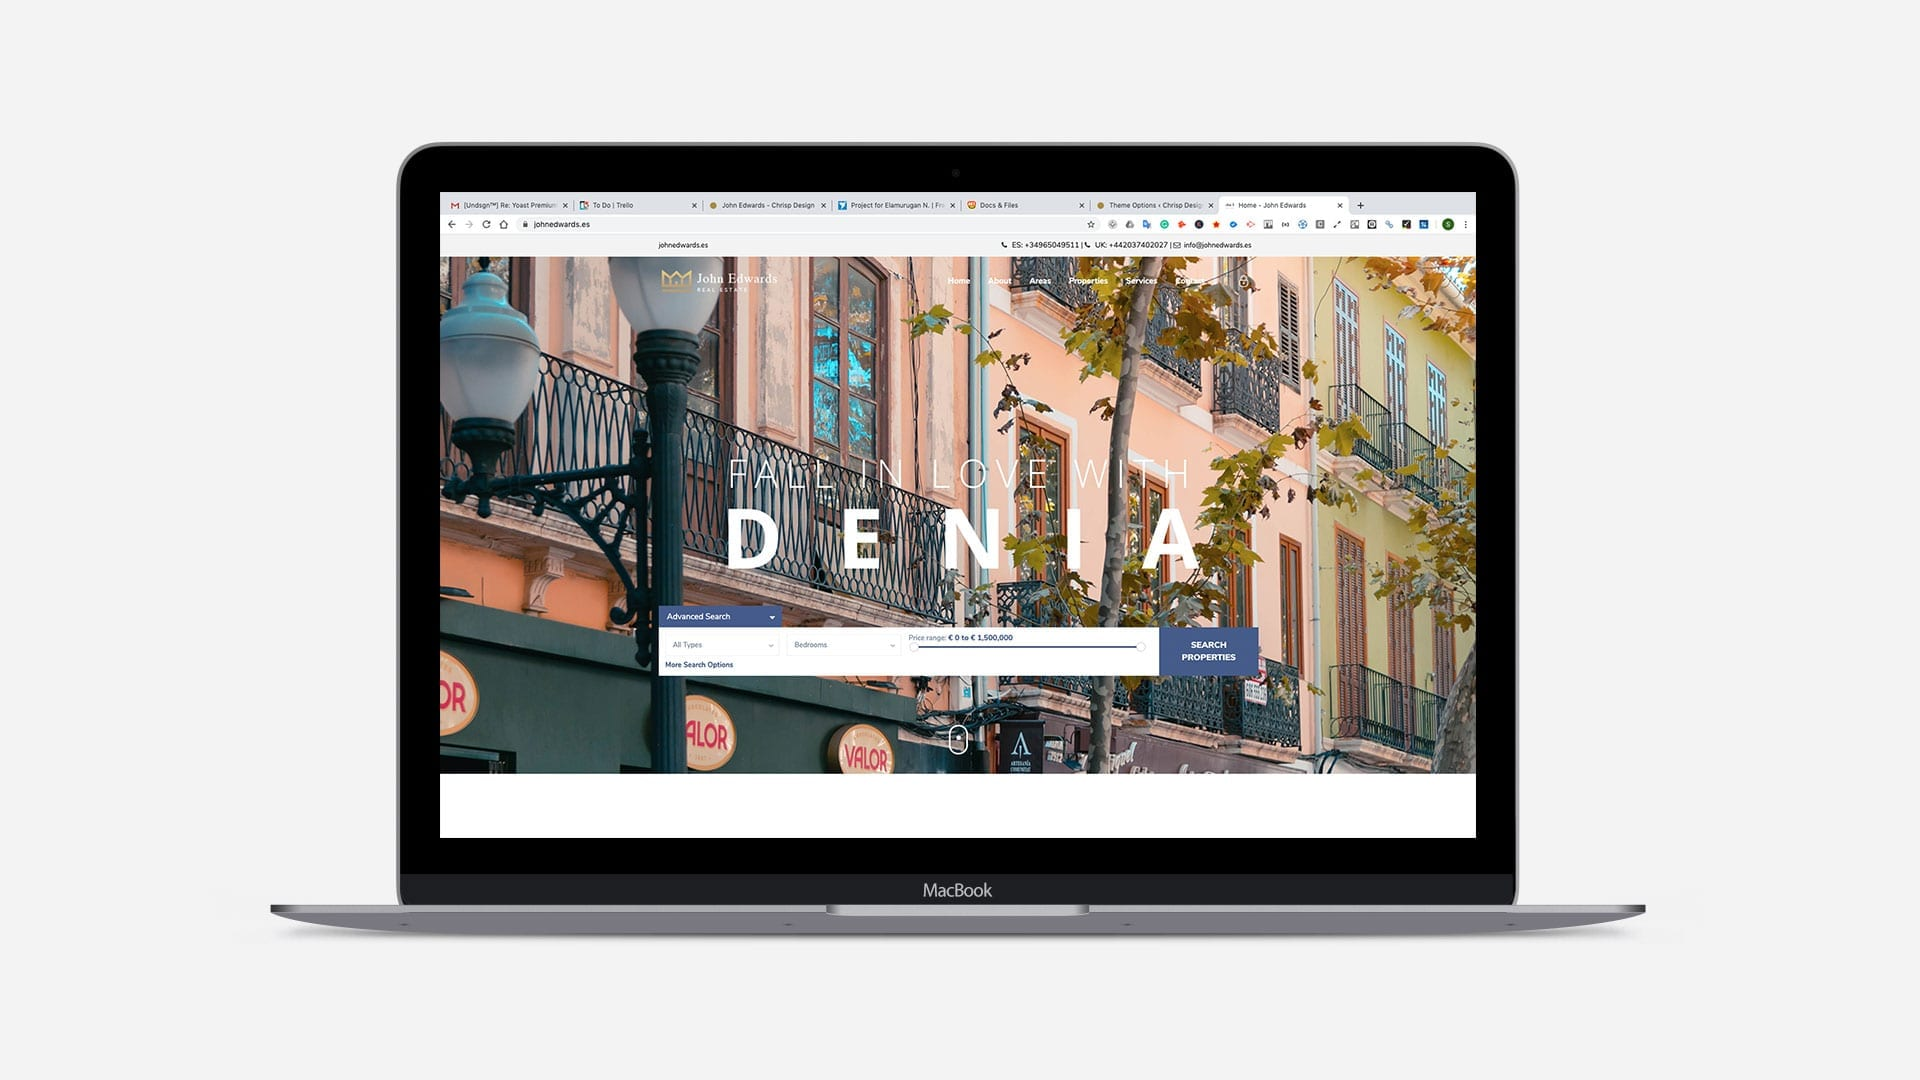 macbook view of website denia